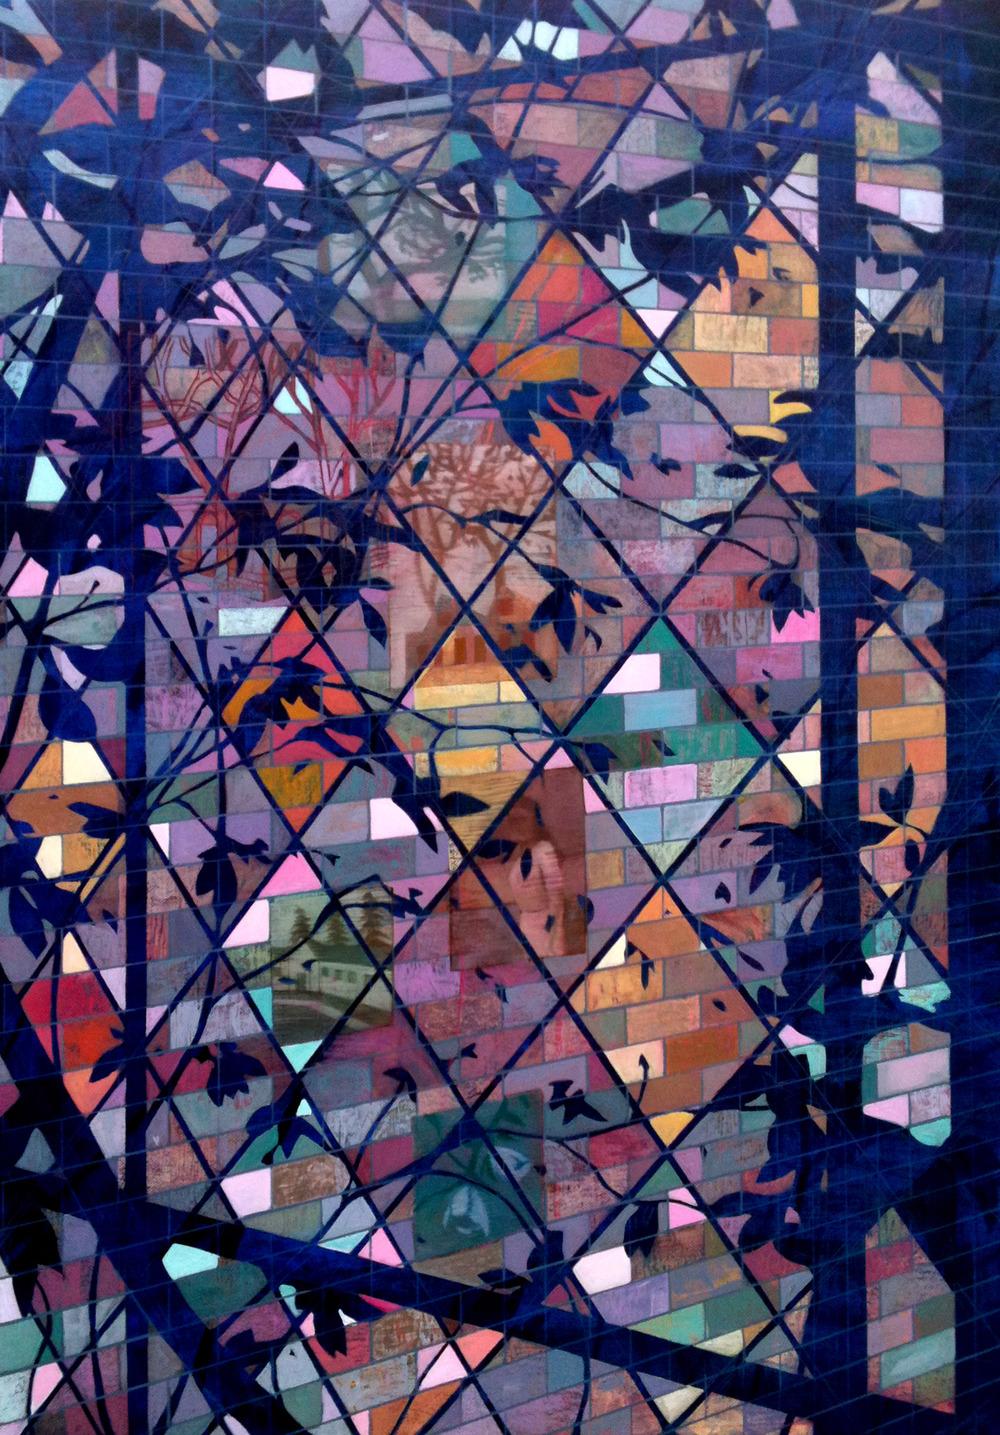 Church Window   29 x 21  Oil On Canvas  2013